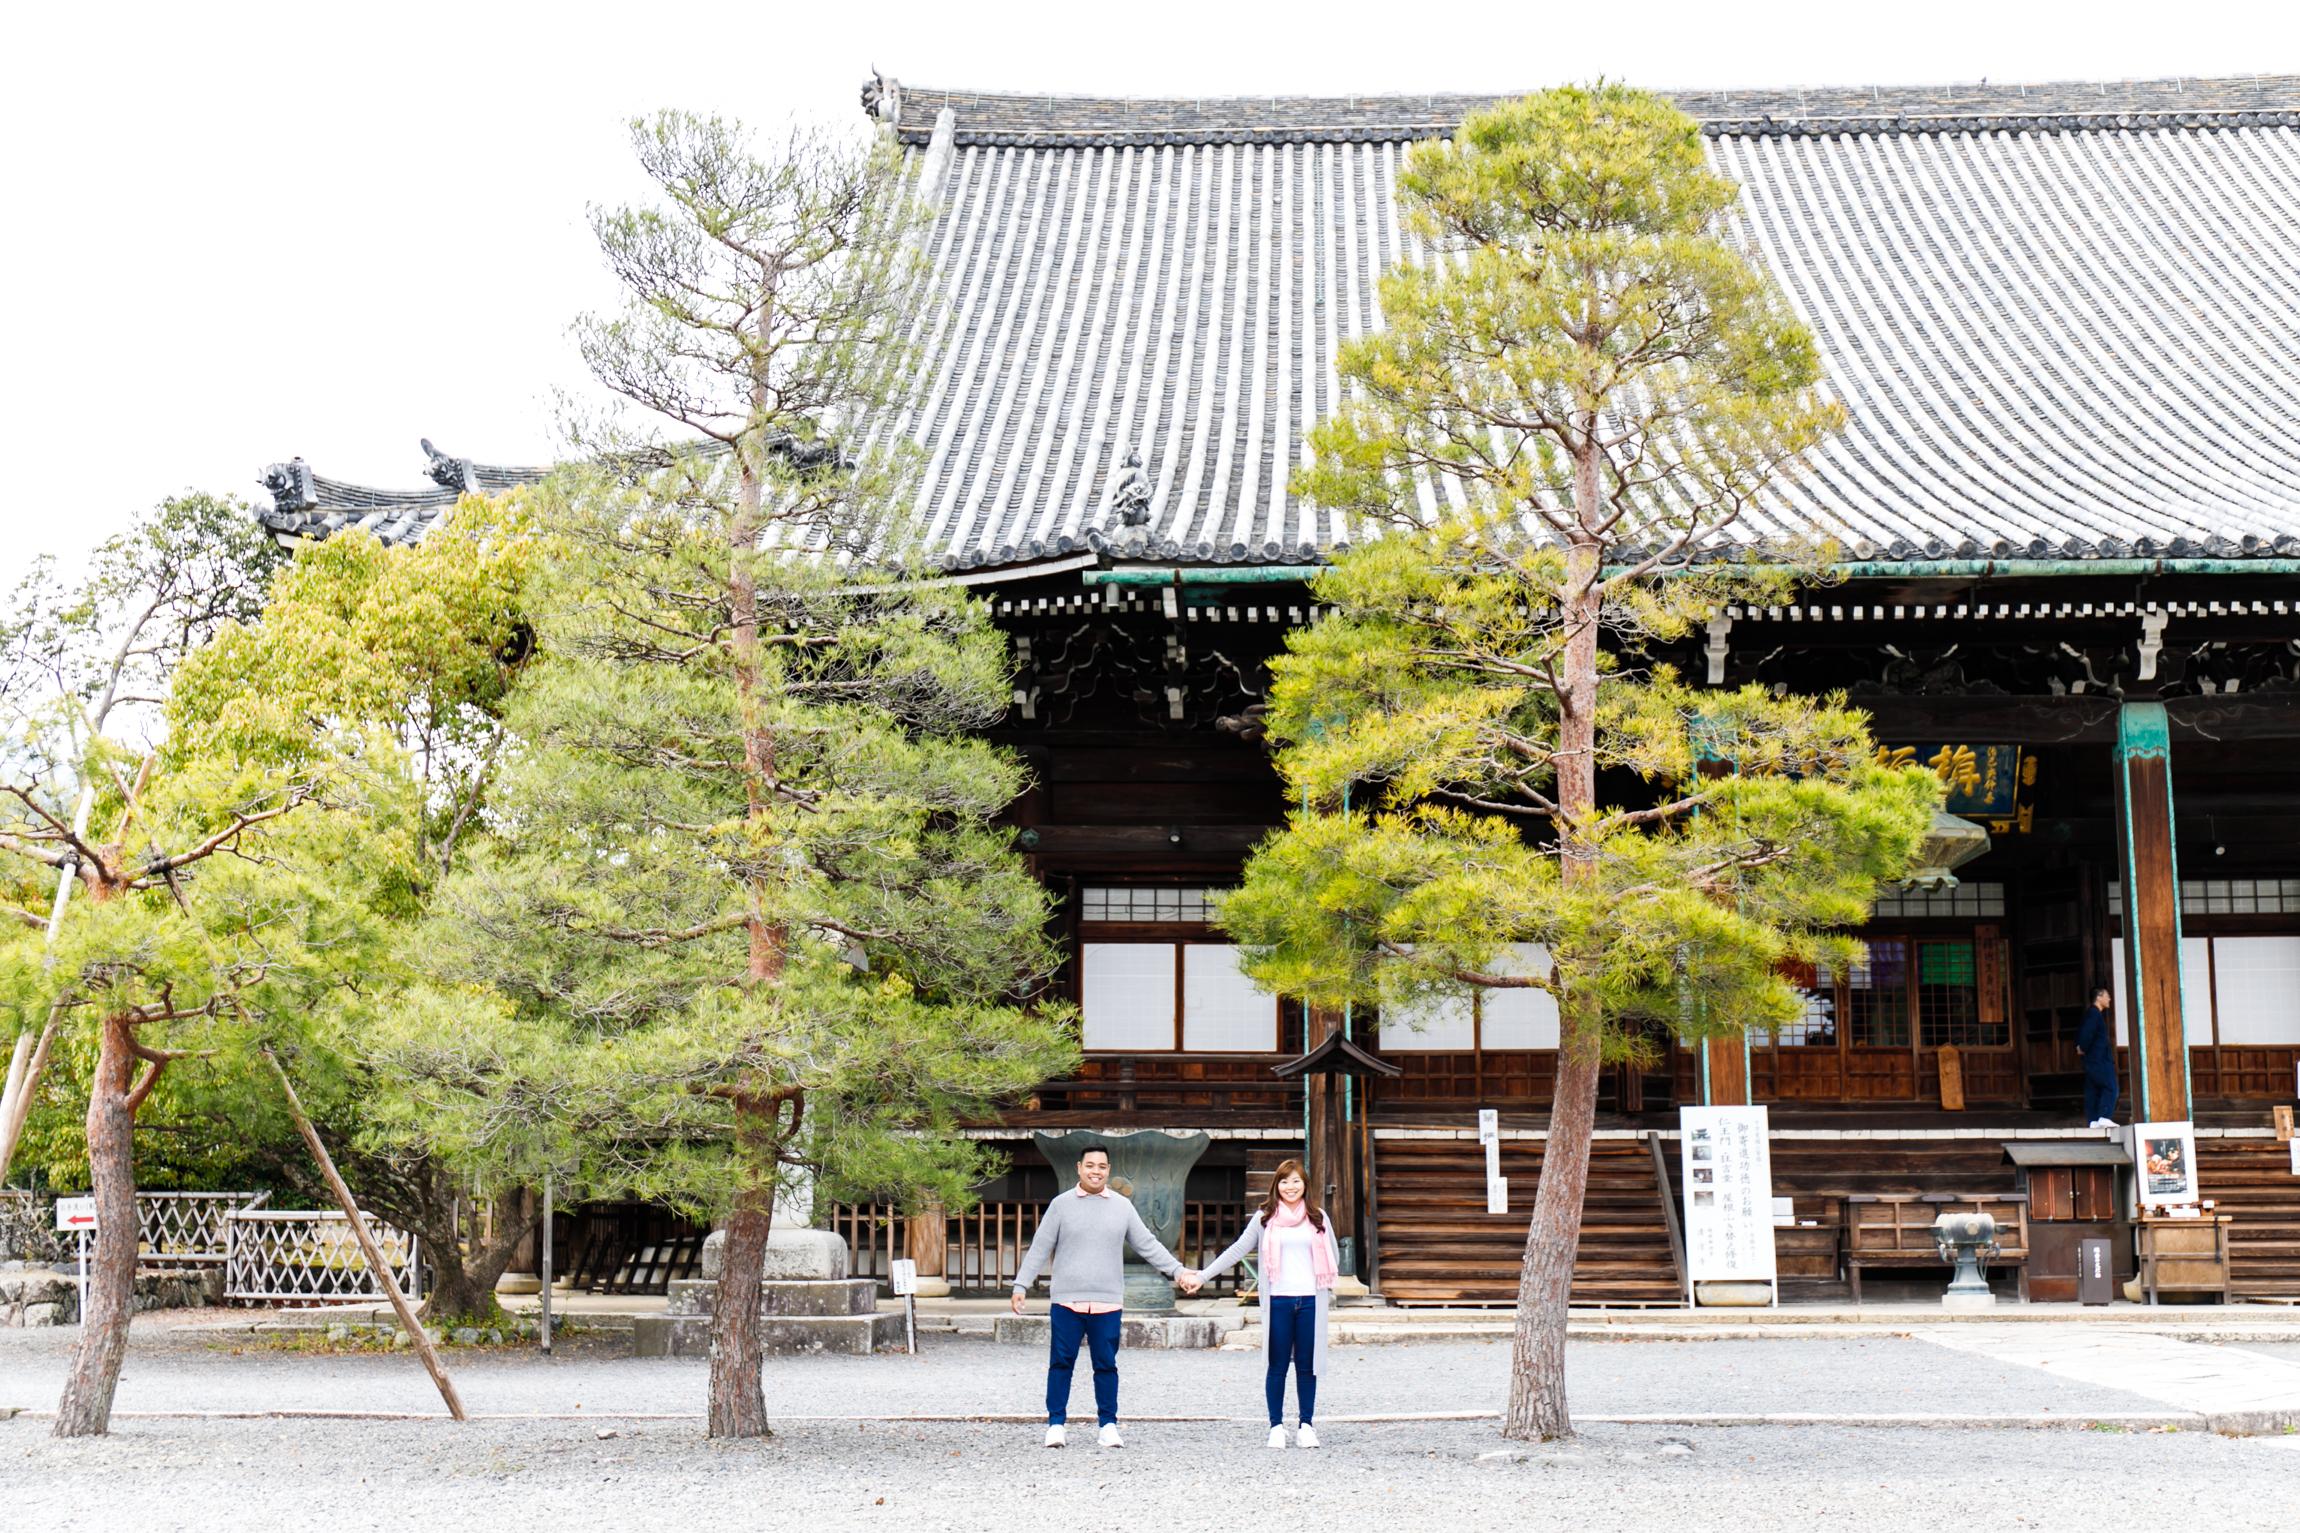 Photoguiderjapan-photoshooting tour in Kyoto,Osaka, Tokyo